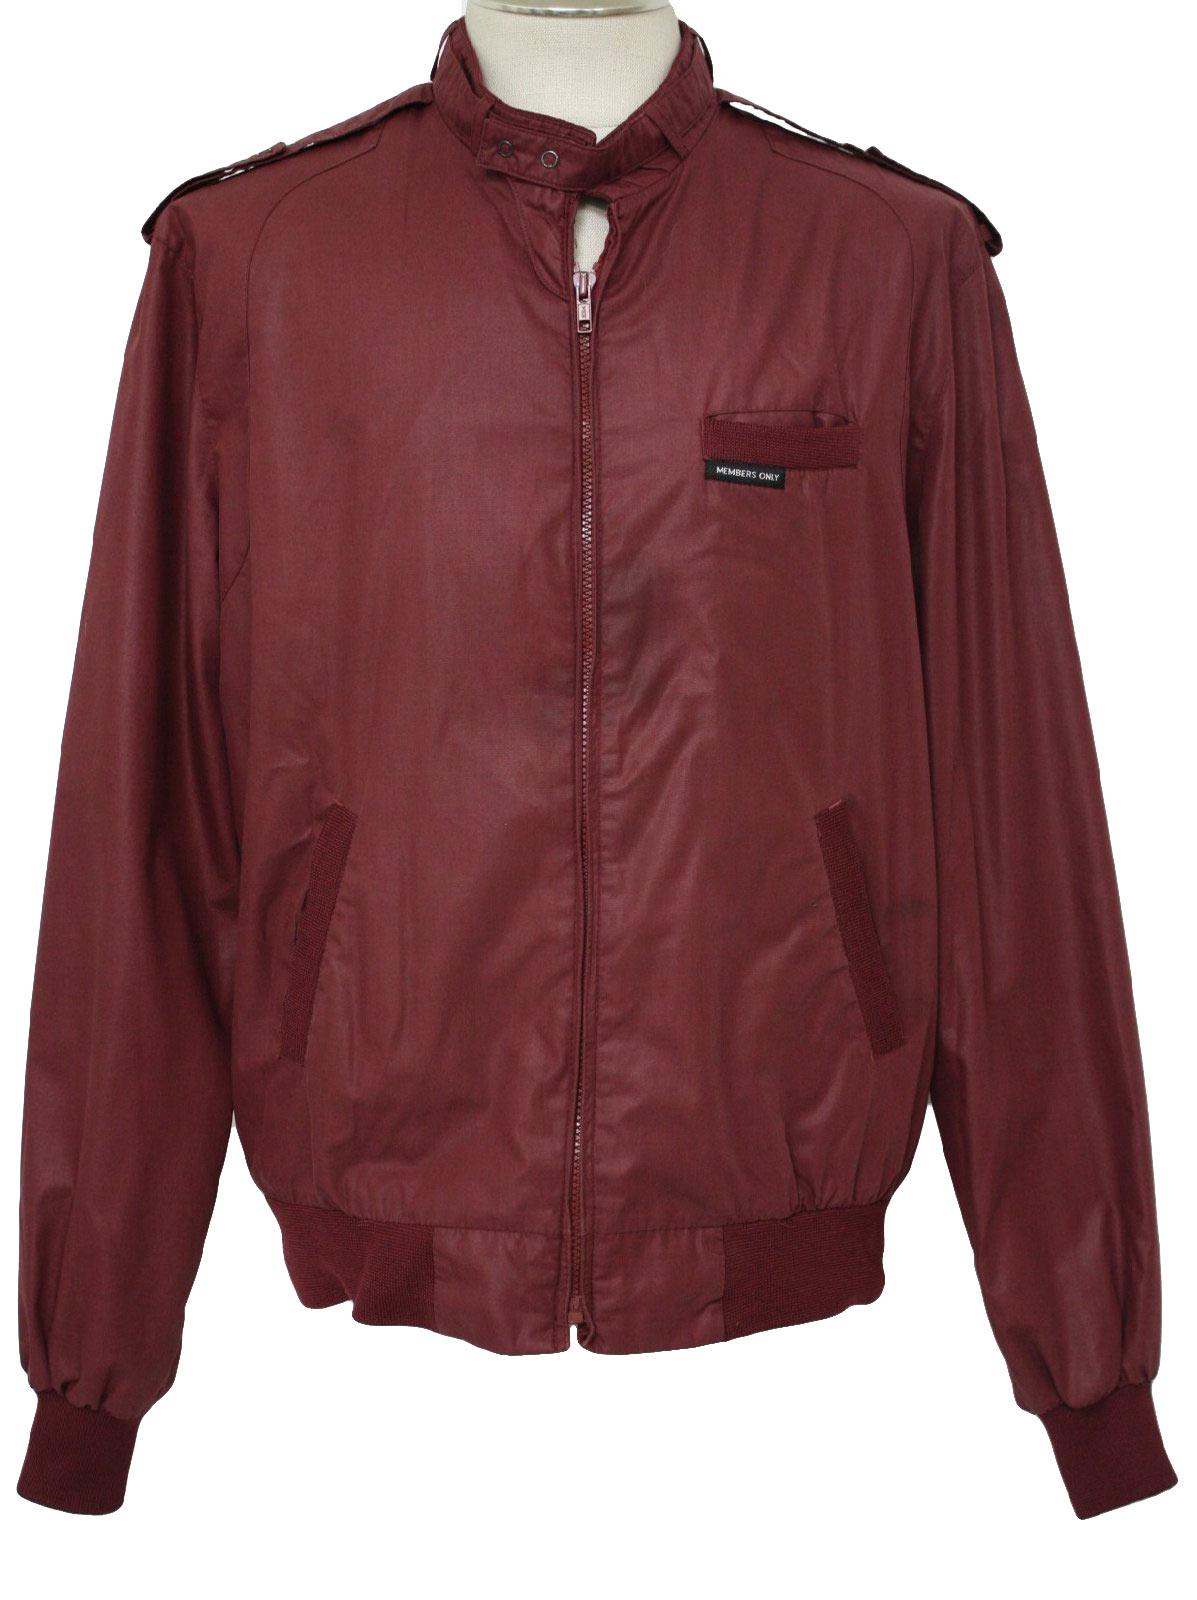 Members Only 80 S Vintage Jacket 80s Members Only Mens